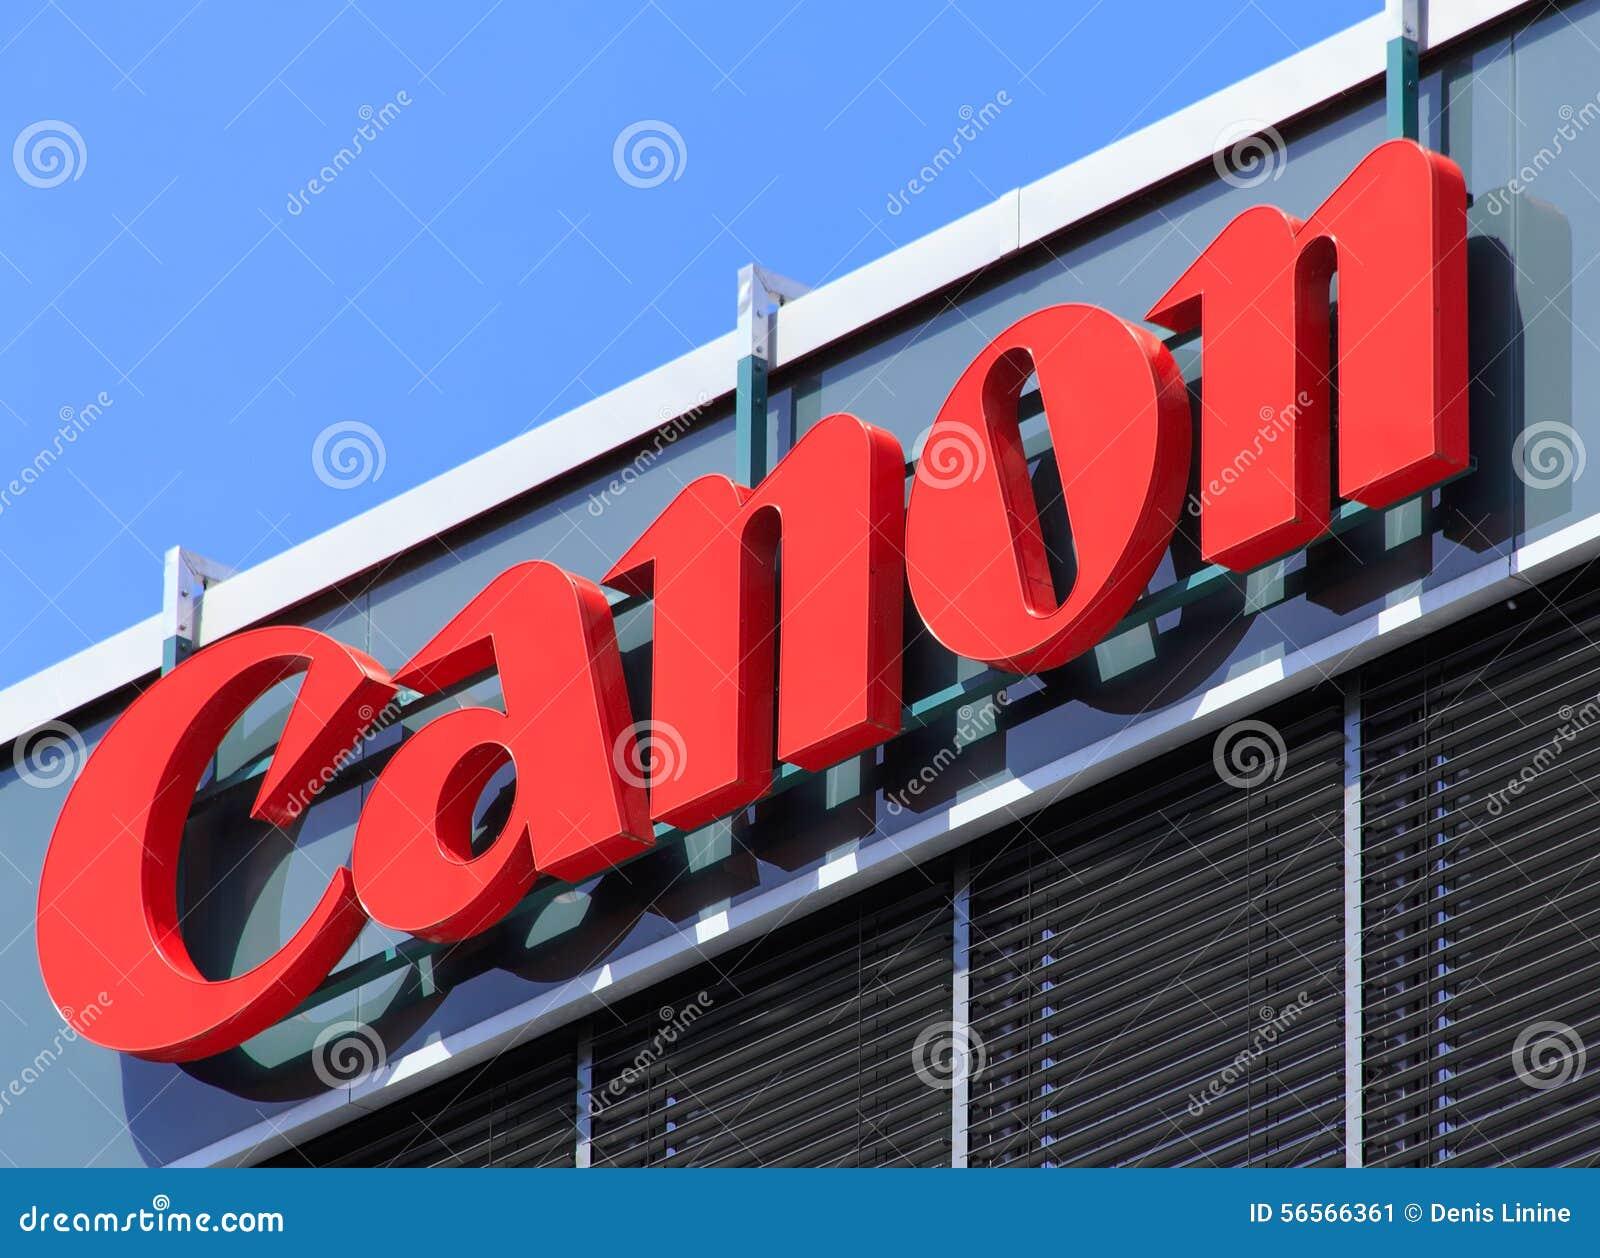 Download Σημάδι στο κτίριο γραφείων της Canon Εκδοτική Εικόνες - εικόνα από λογότυπο, απεικόνιση: 56566361